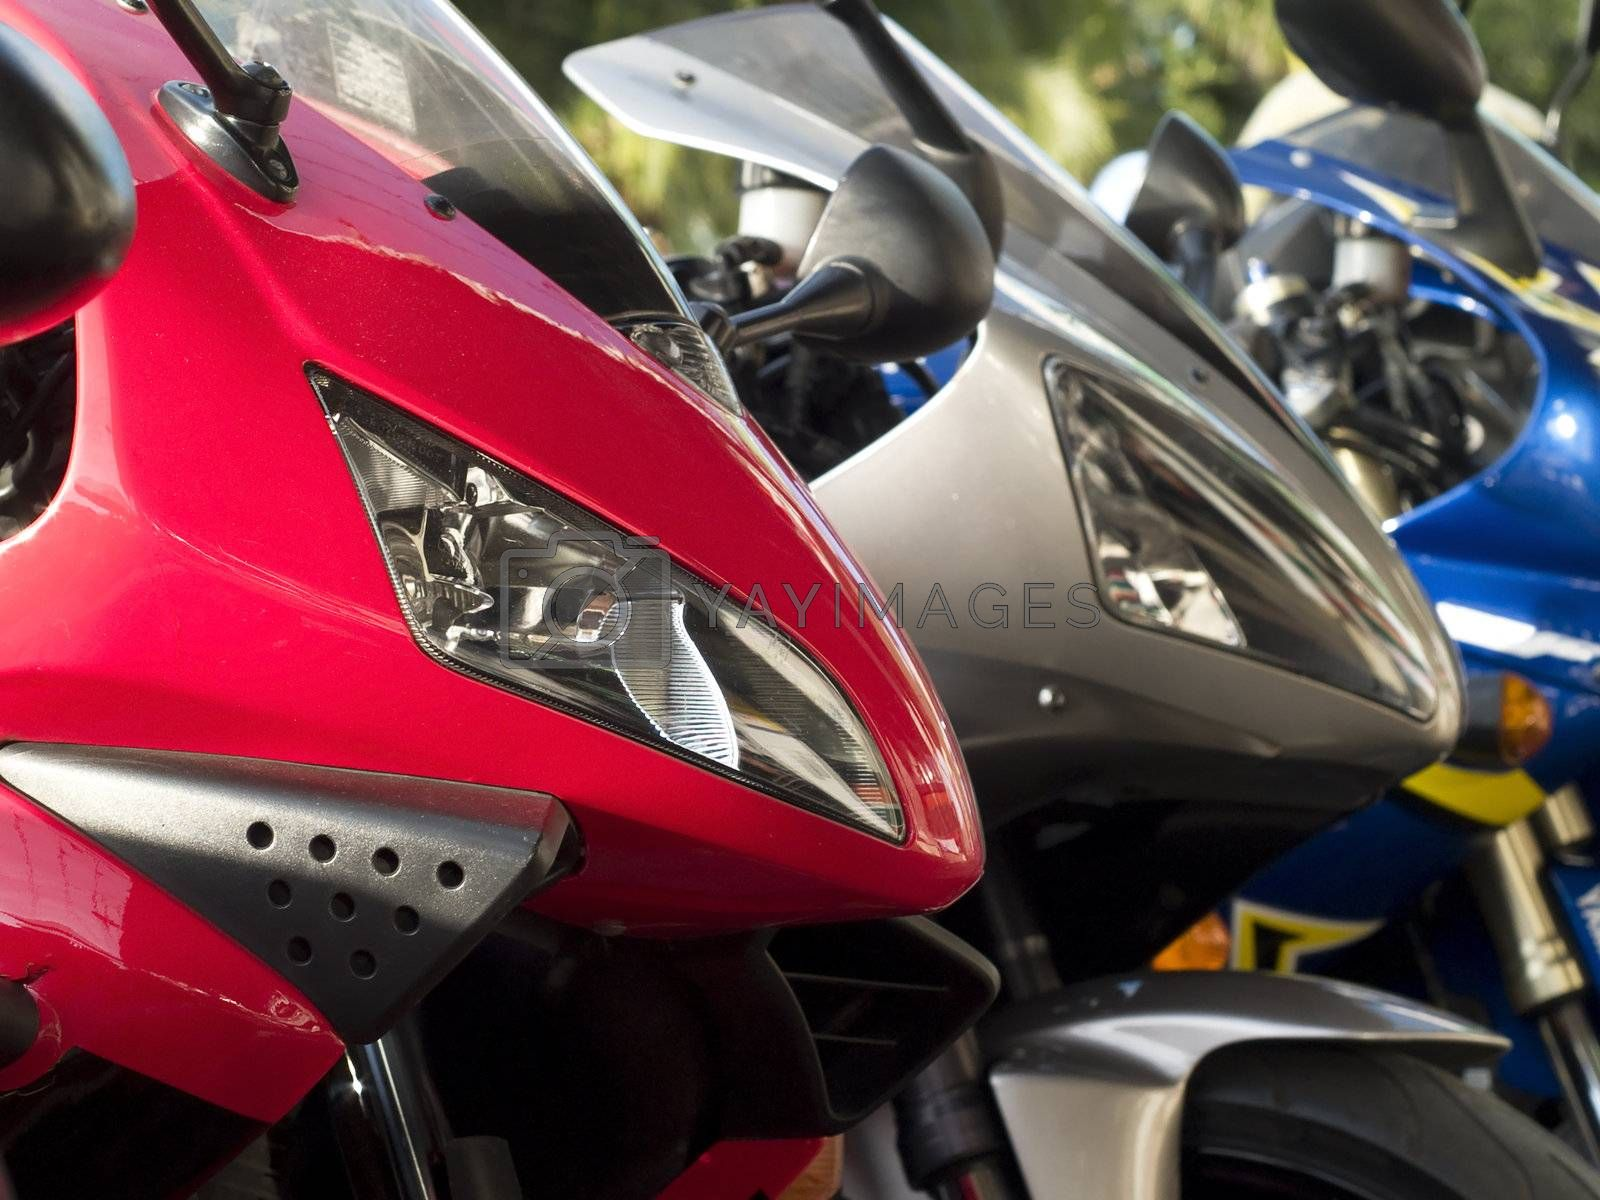 Three motorbikes by epixx